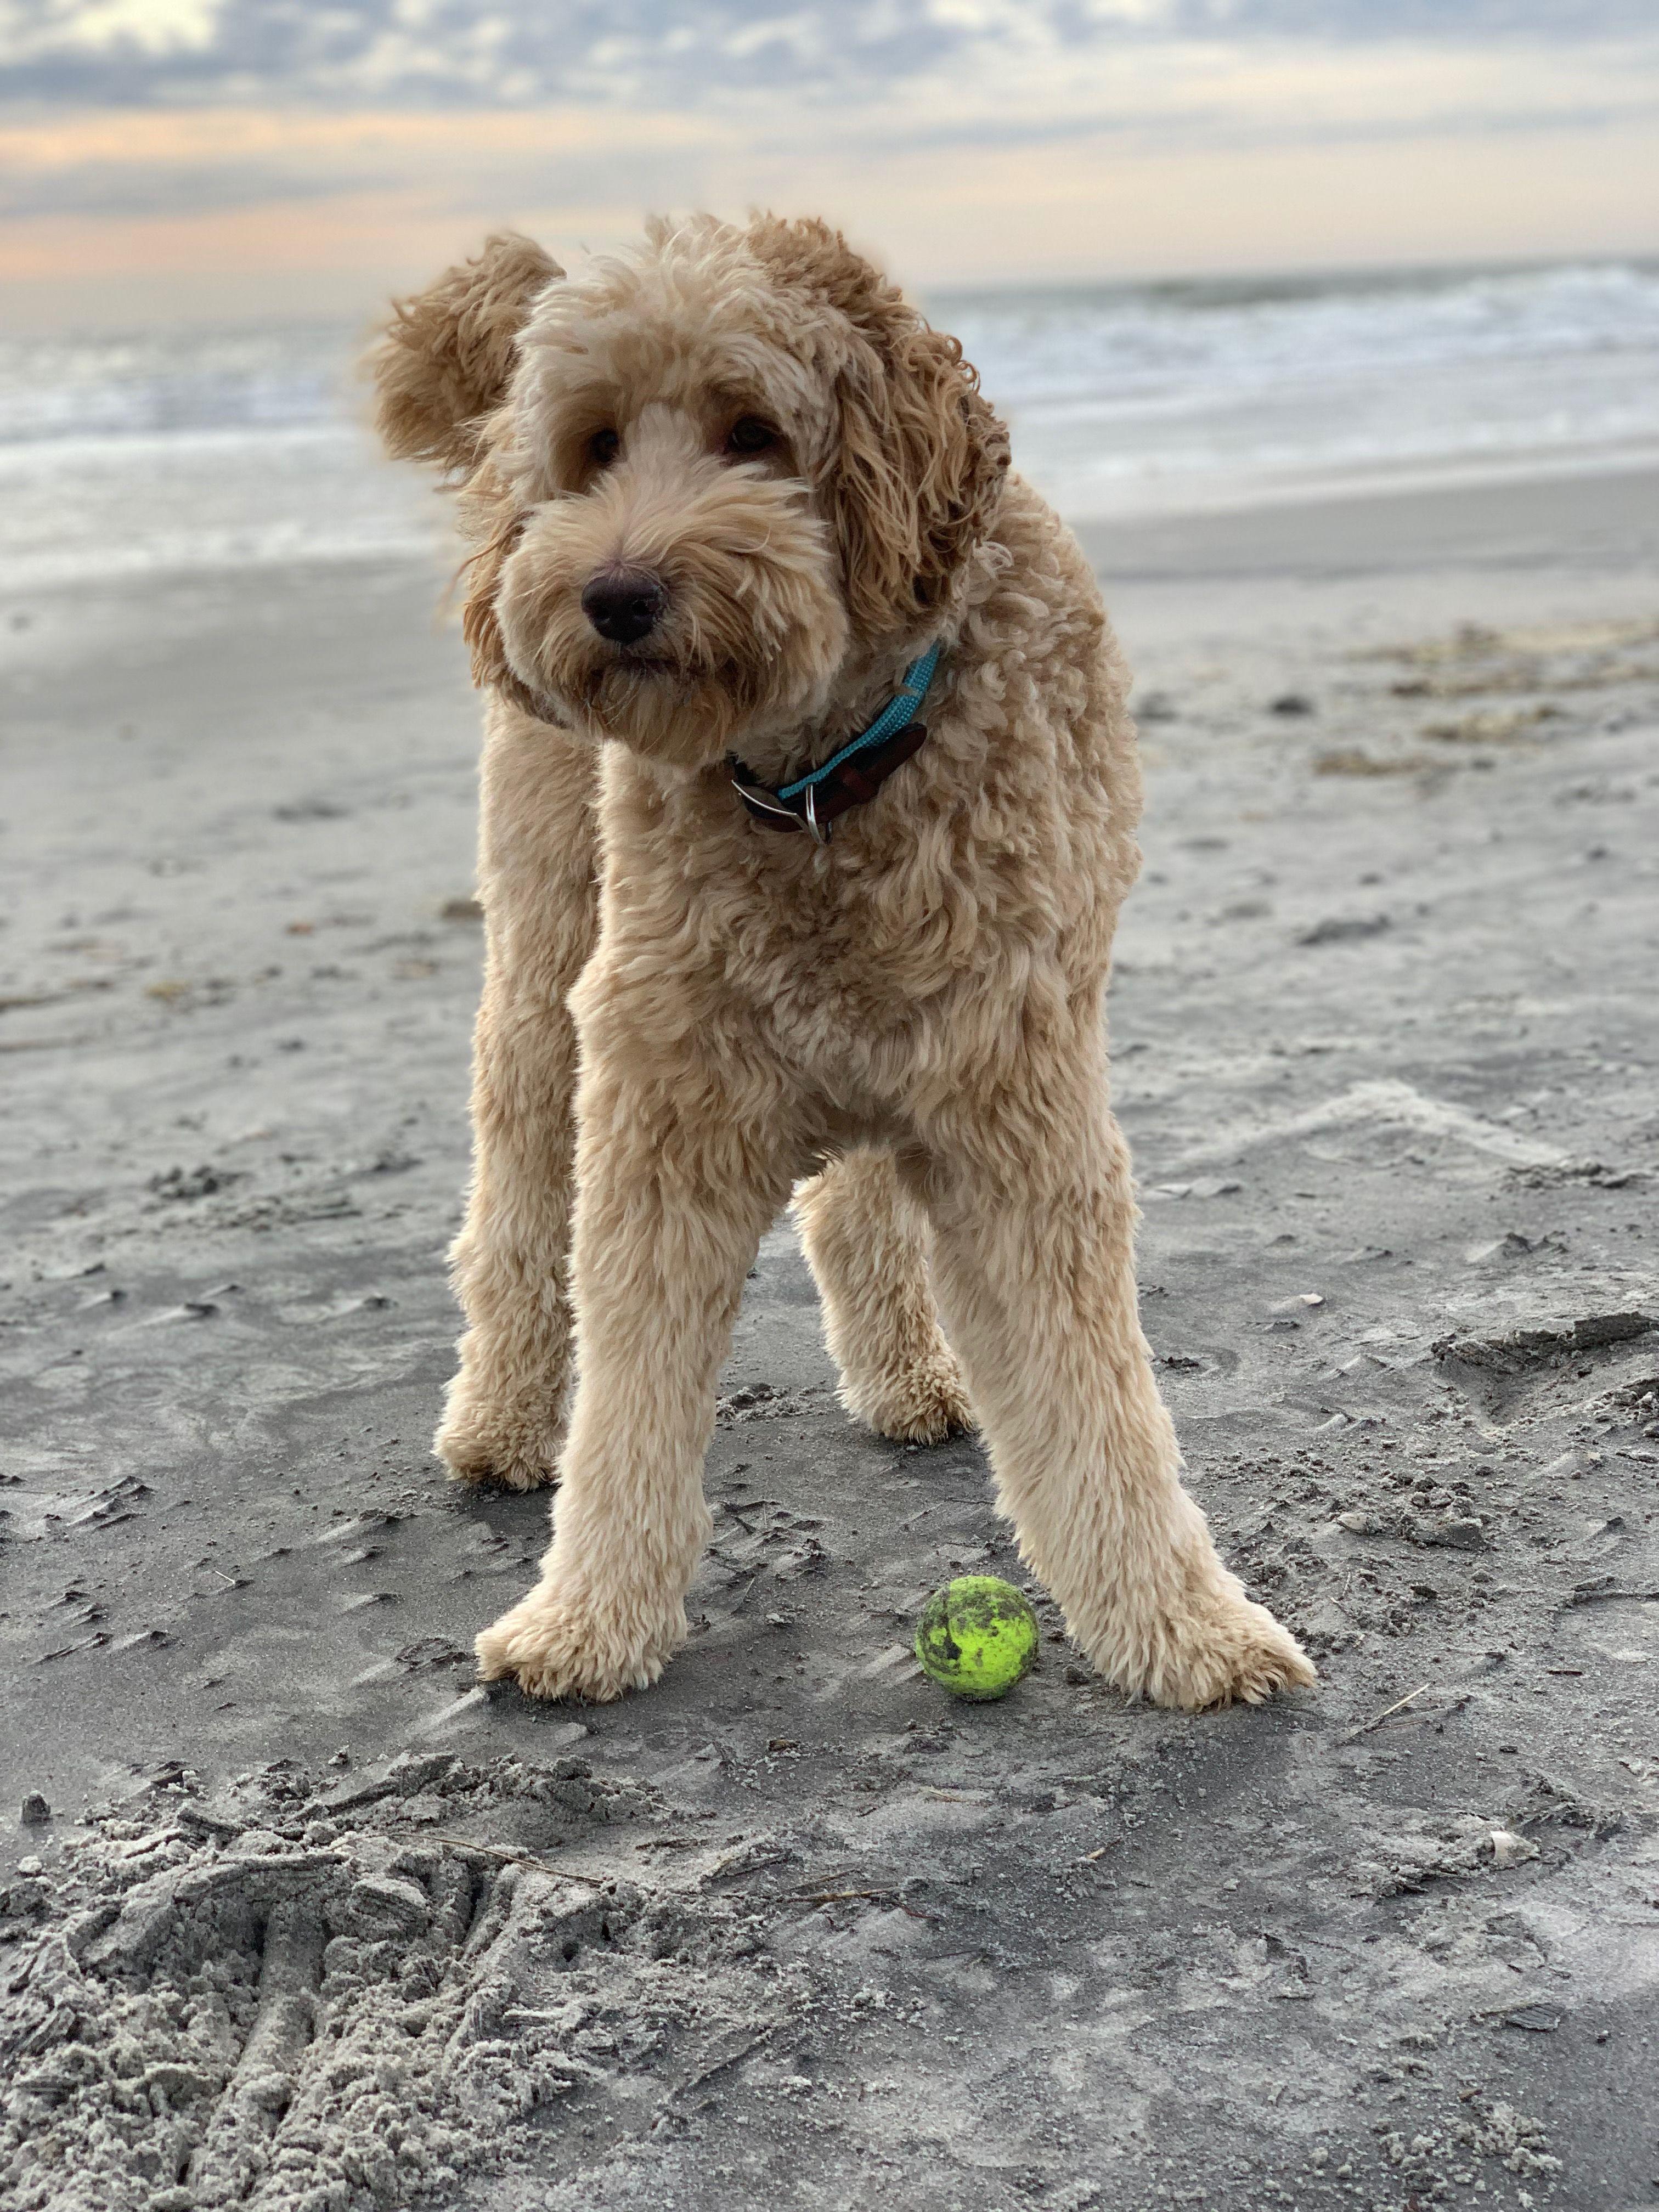 Pin On Original Coast Line Dog Leashes Collars Harnesses